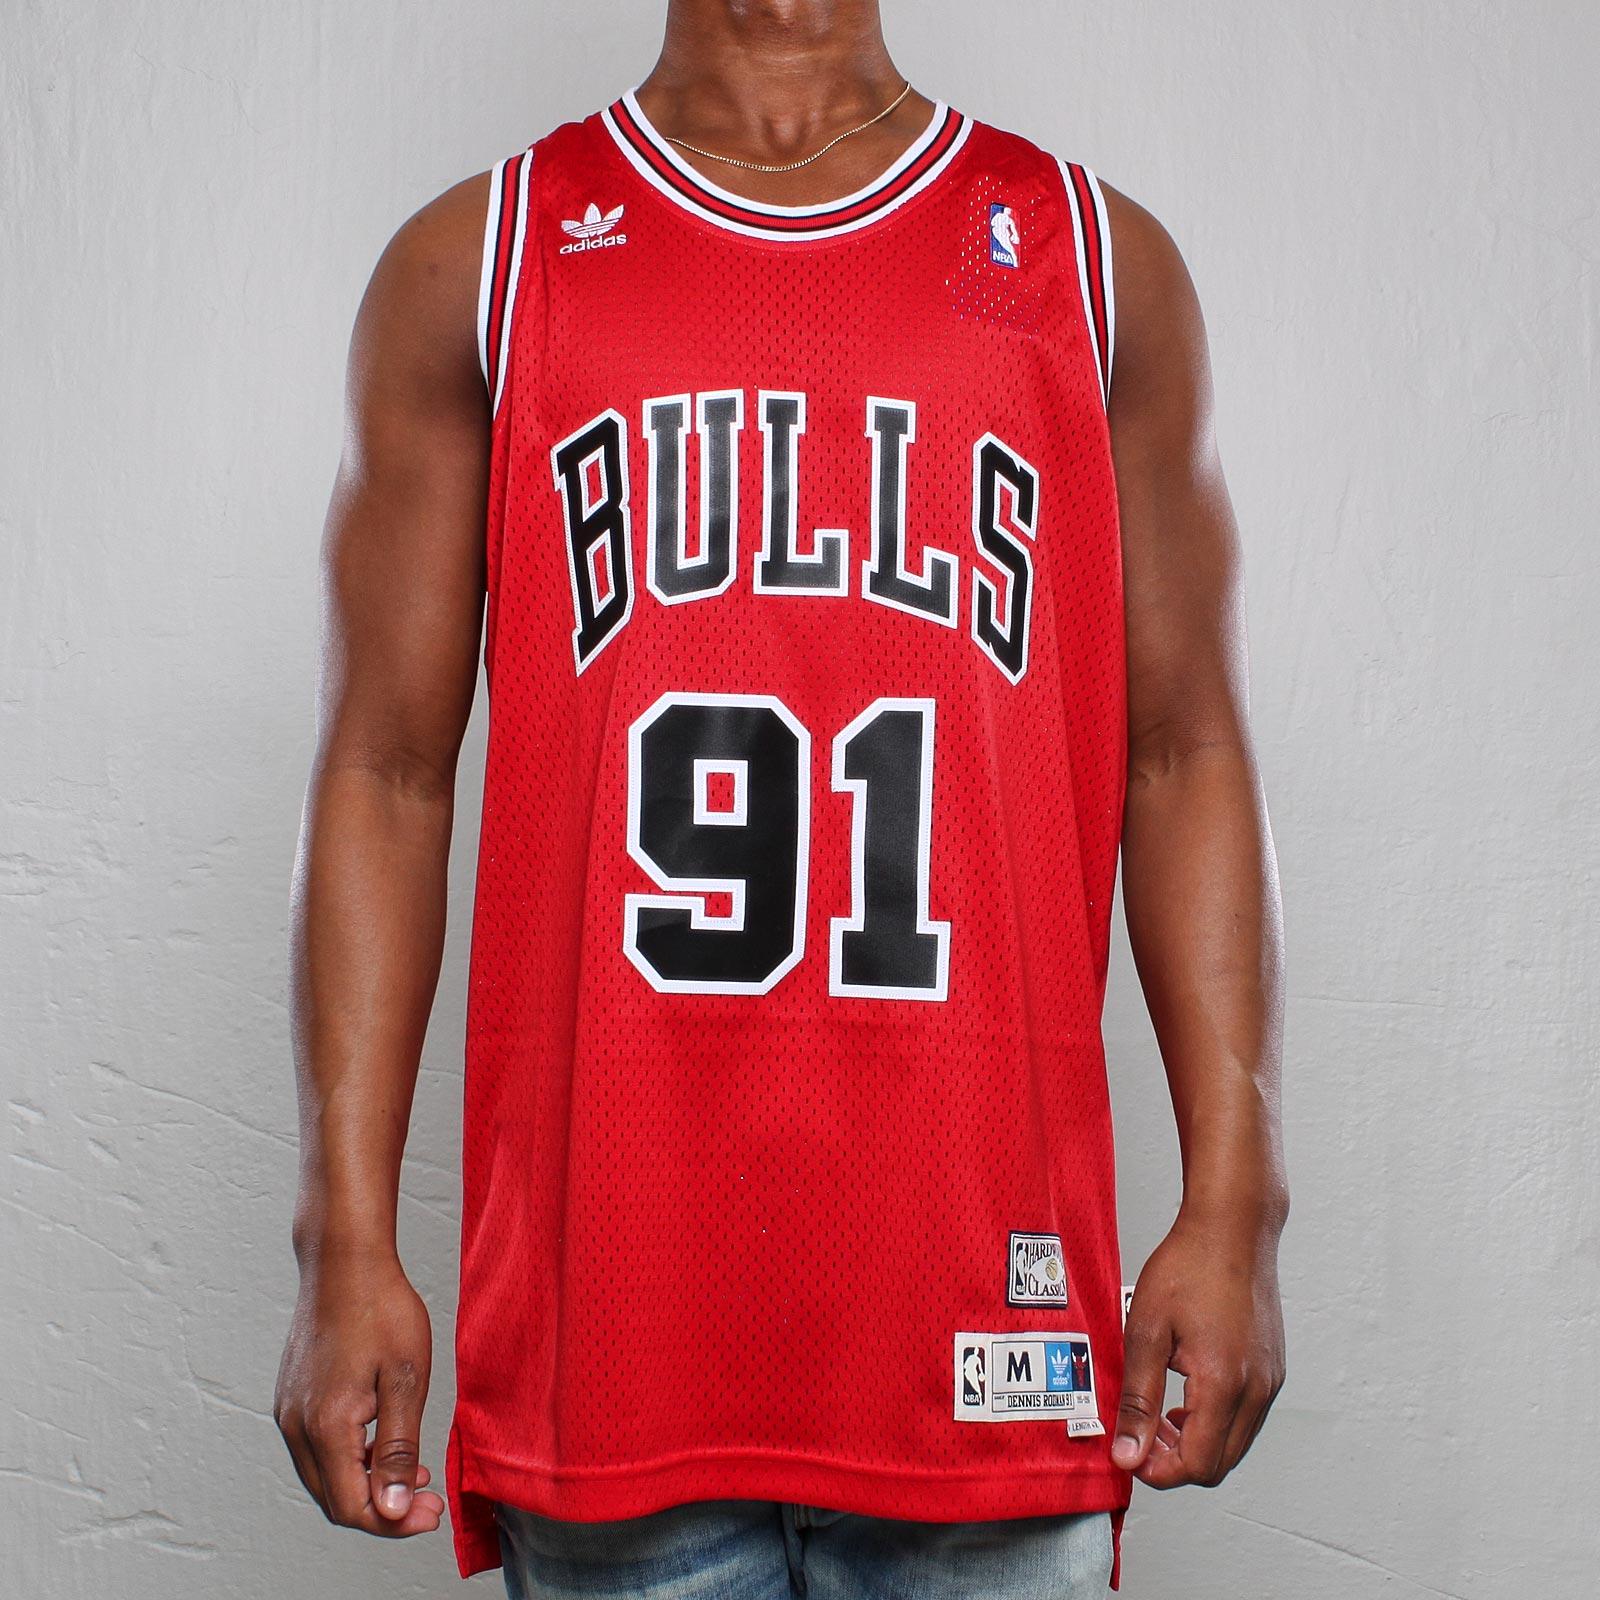 03beb6ddd62 adidas Chicago Bulls Soul Swingman Jersey - 101430 ...